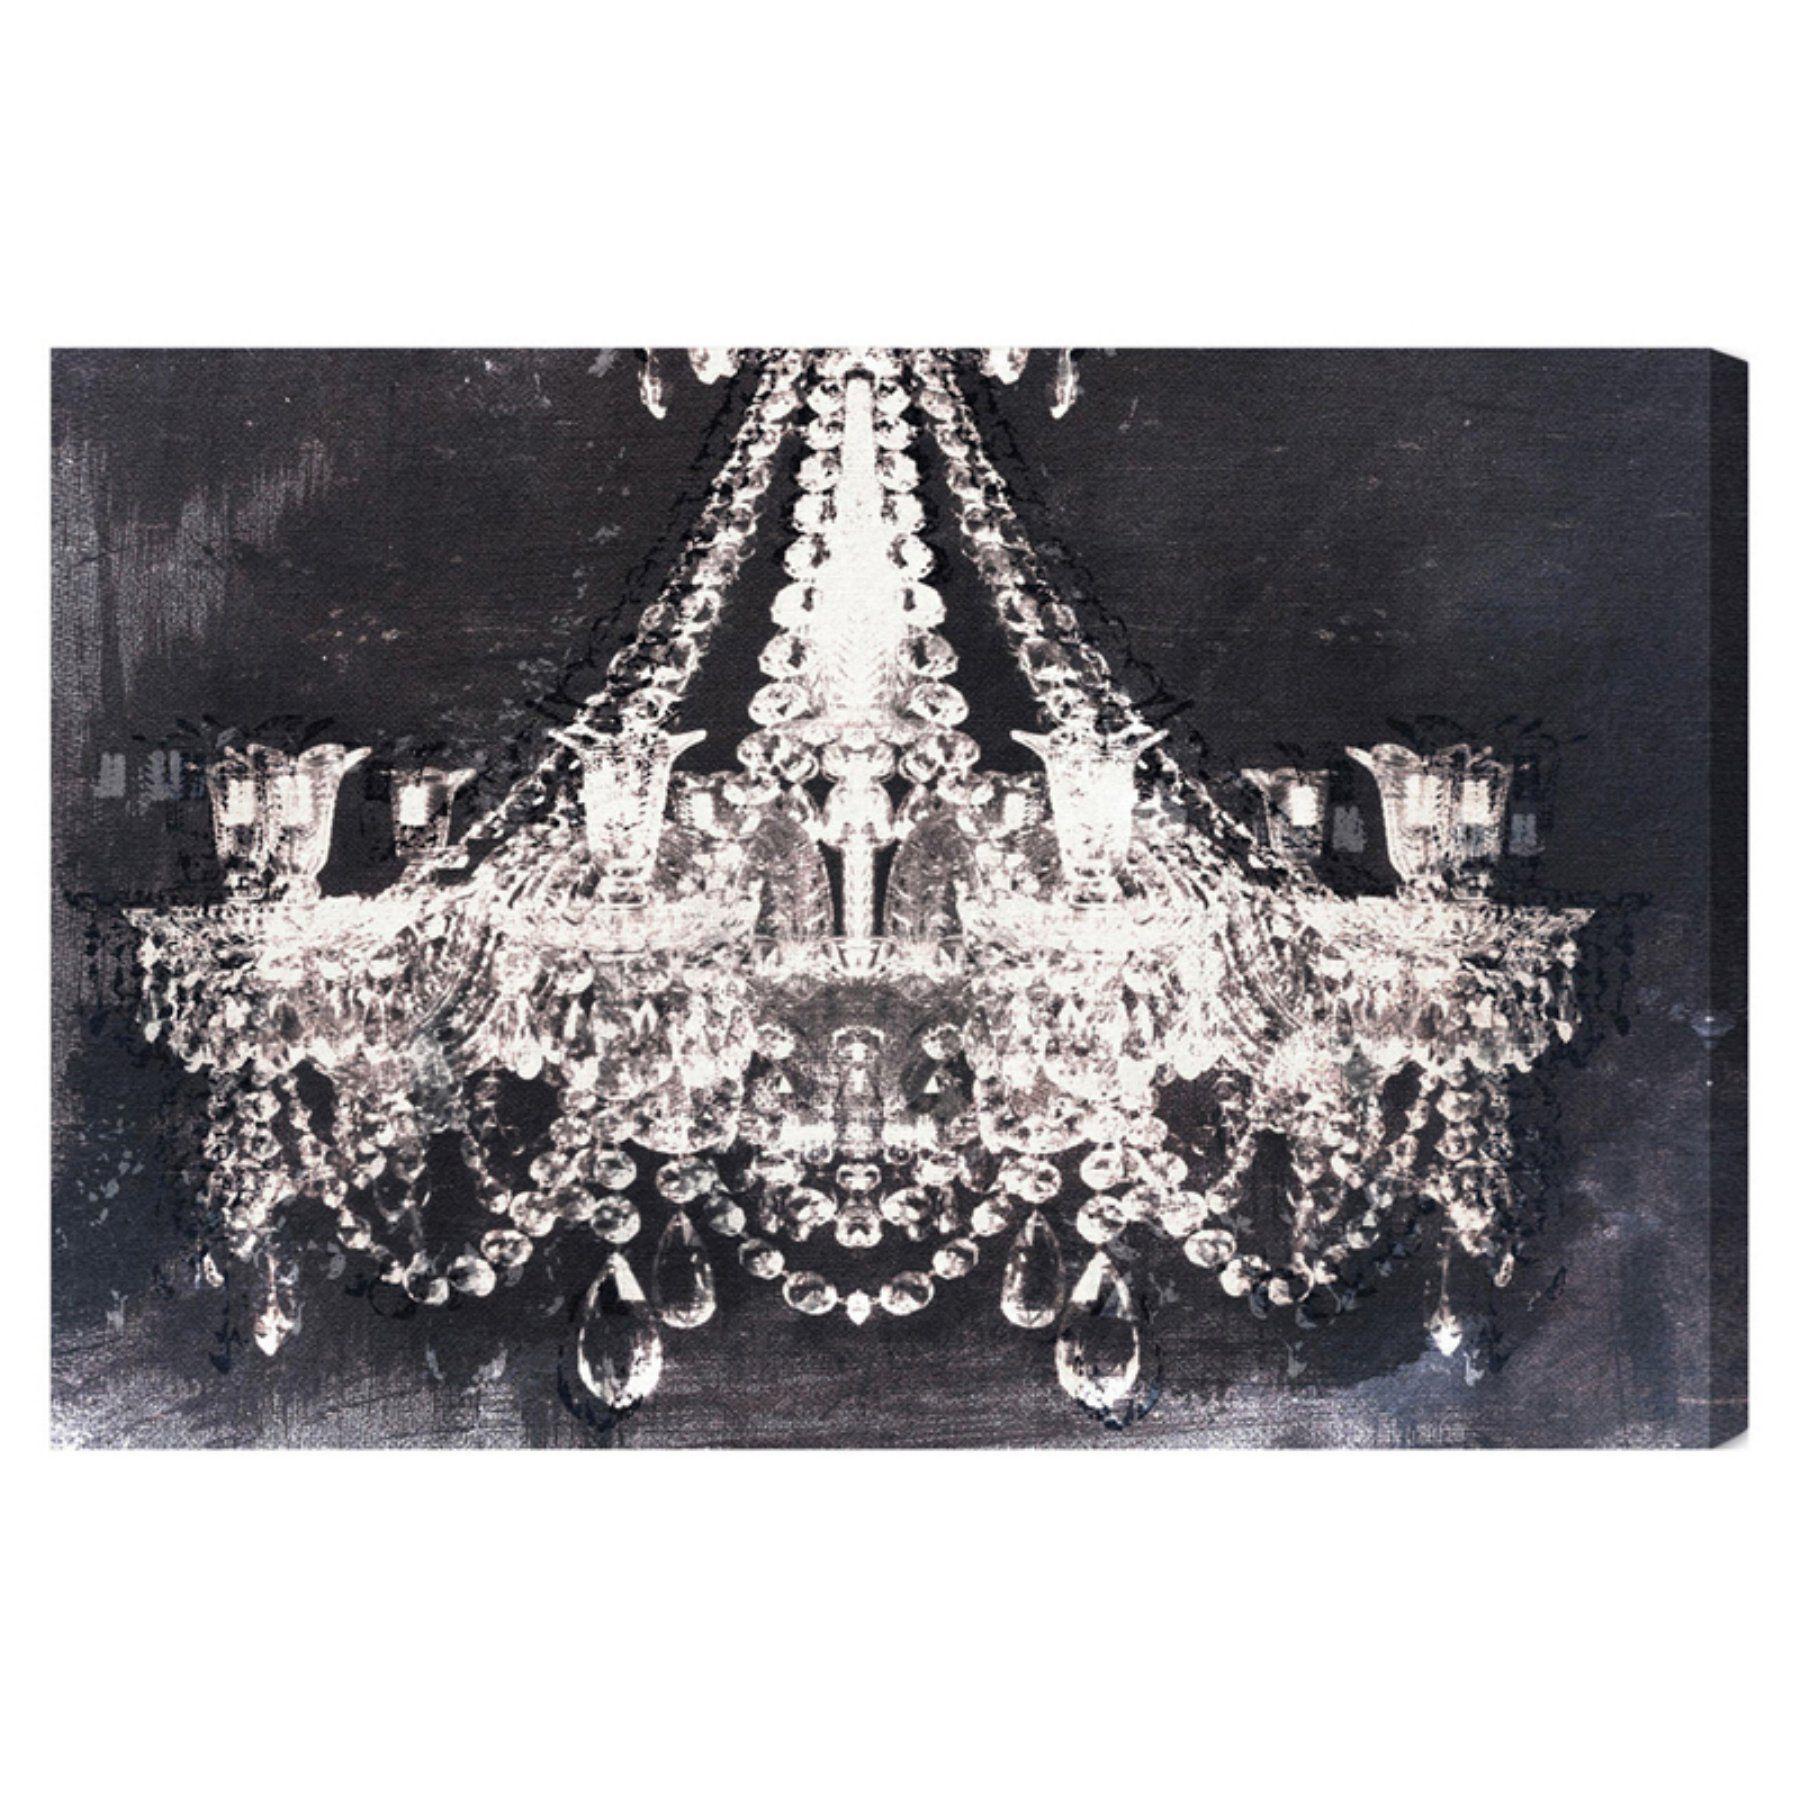 Oliver Gal Dramatic Entrance Night Canvas Art  10869 15X10 Canv Xhd